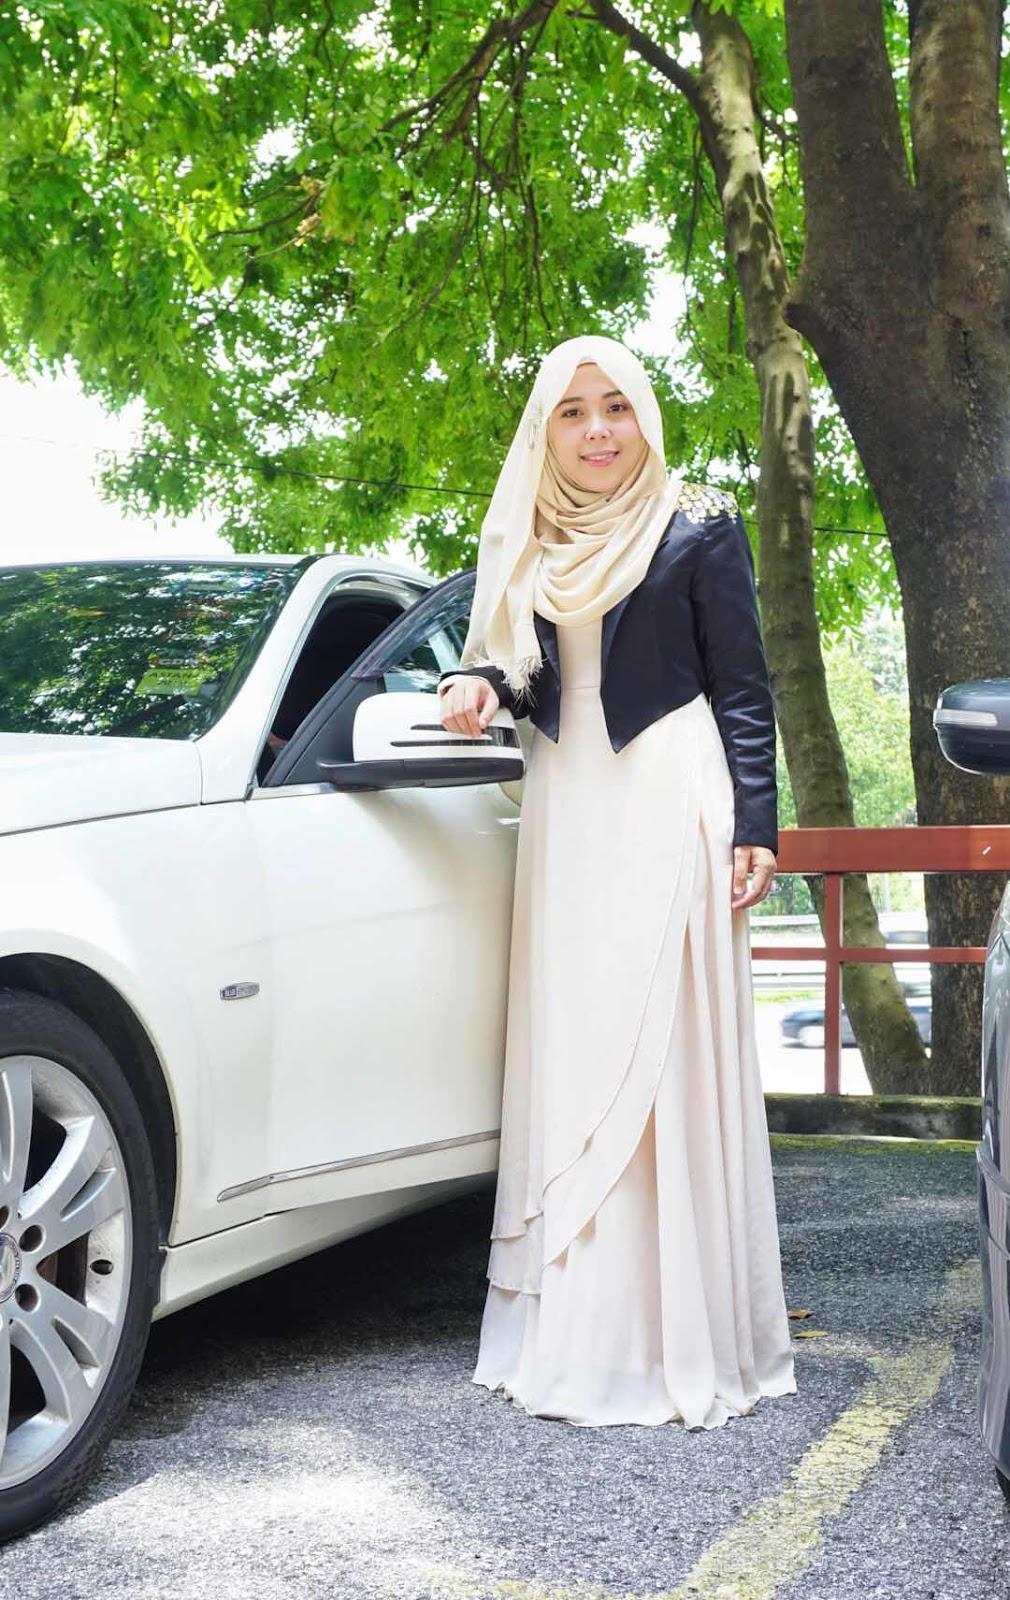 premium Beautiful Selayang, Min Kaffe Saujana Utama, Premium beautiful stokis agent